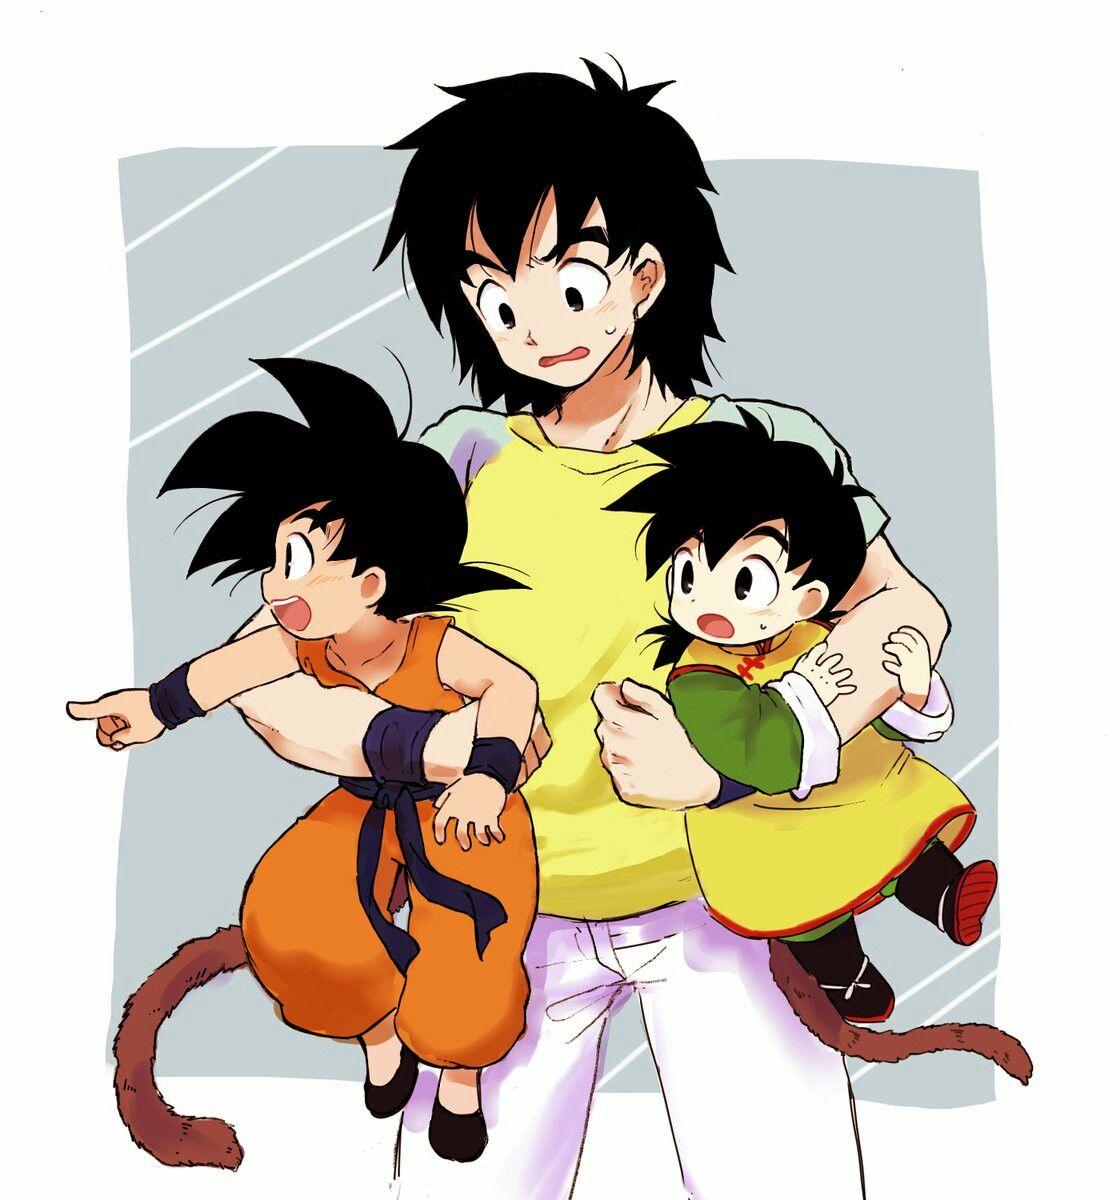 Goten With Kid Goku And Kid Gohan Xd Dragon Ball Super Goku Anime Dragon Ball Kid Goku